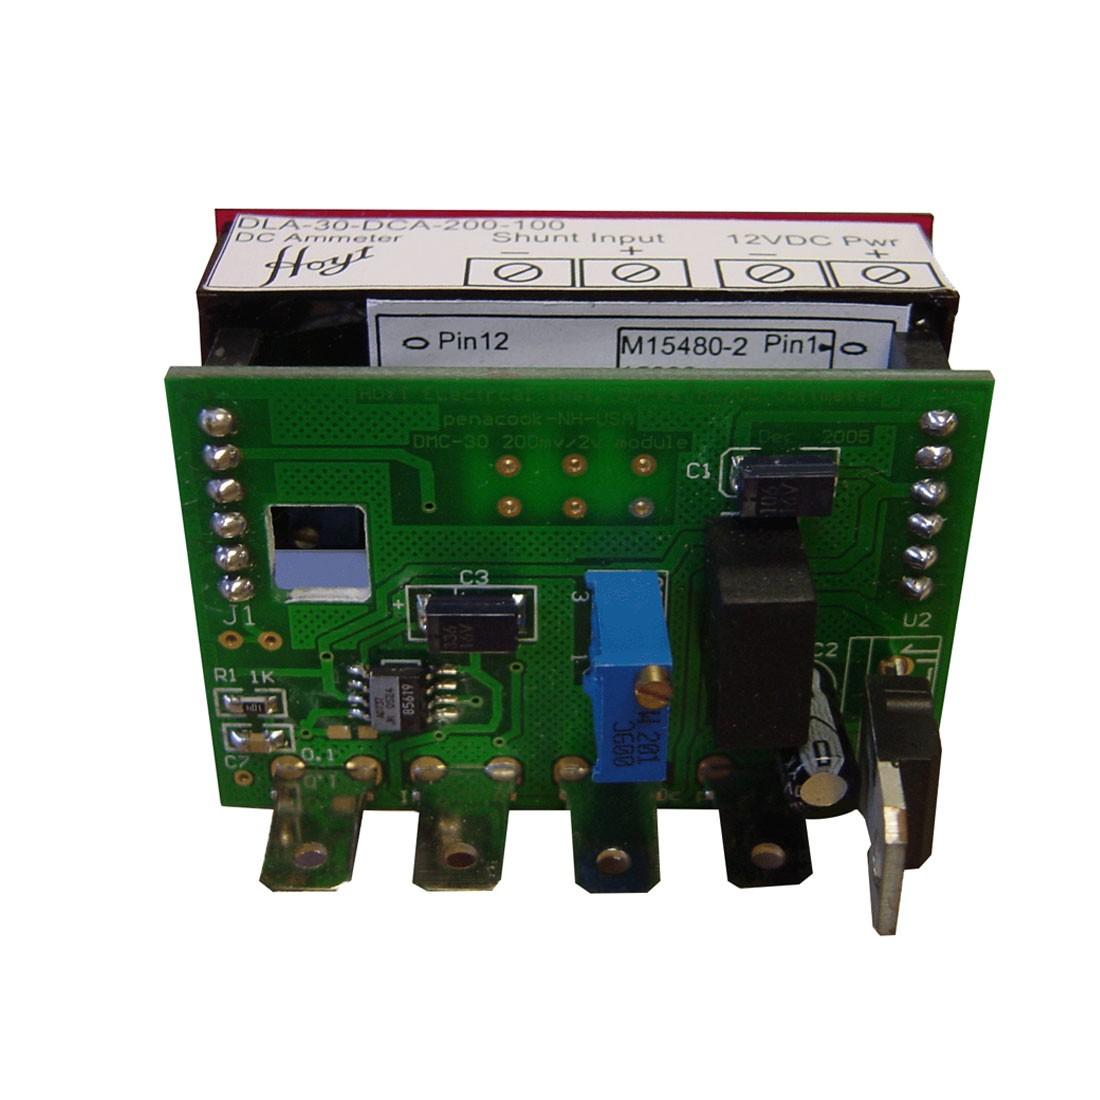 DLA-30-DCA-200-100 LED DC Ammeter - Front View